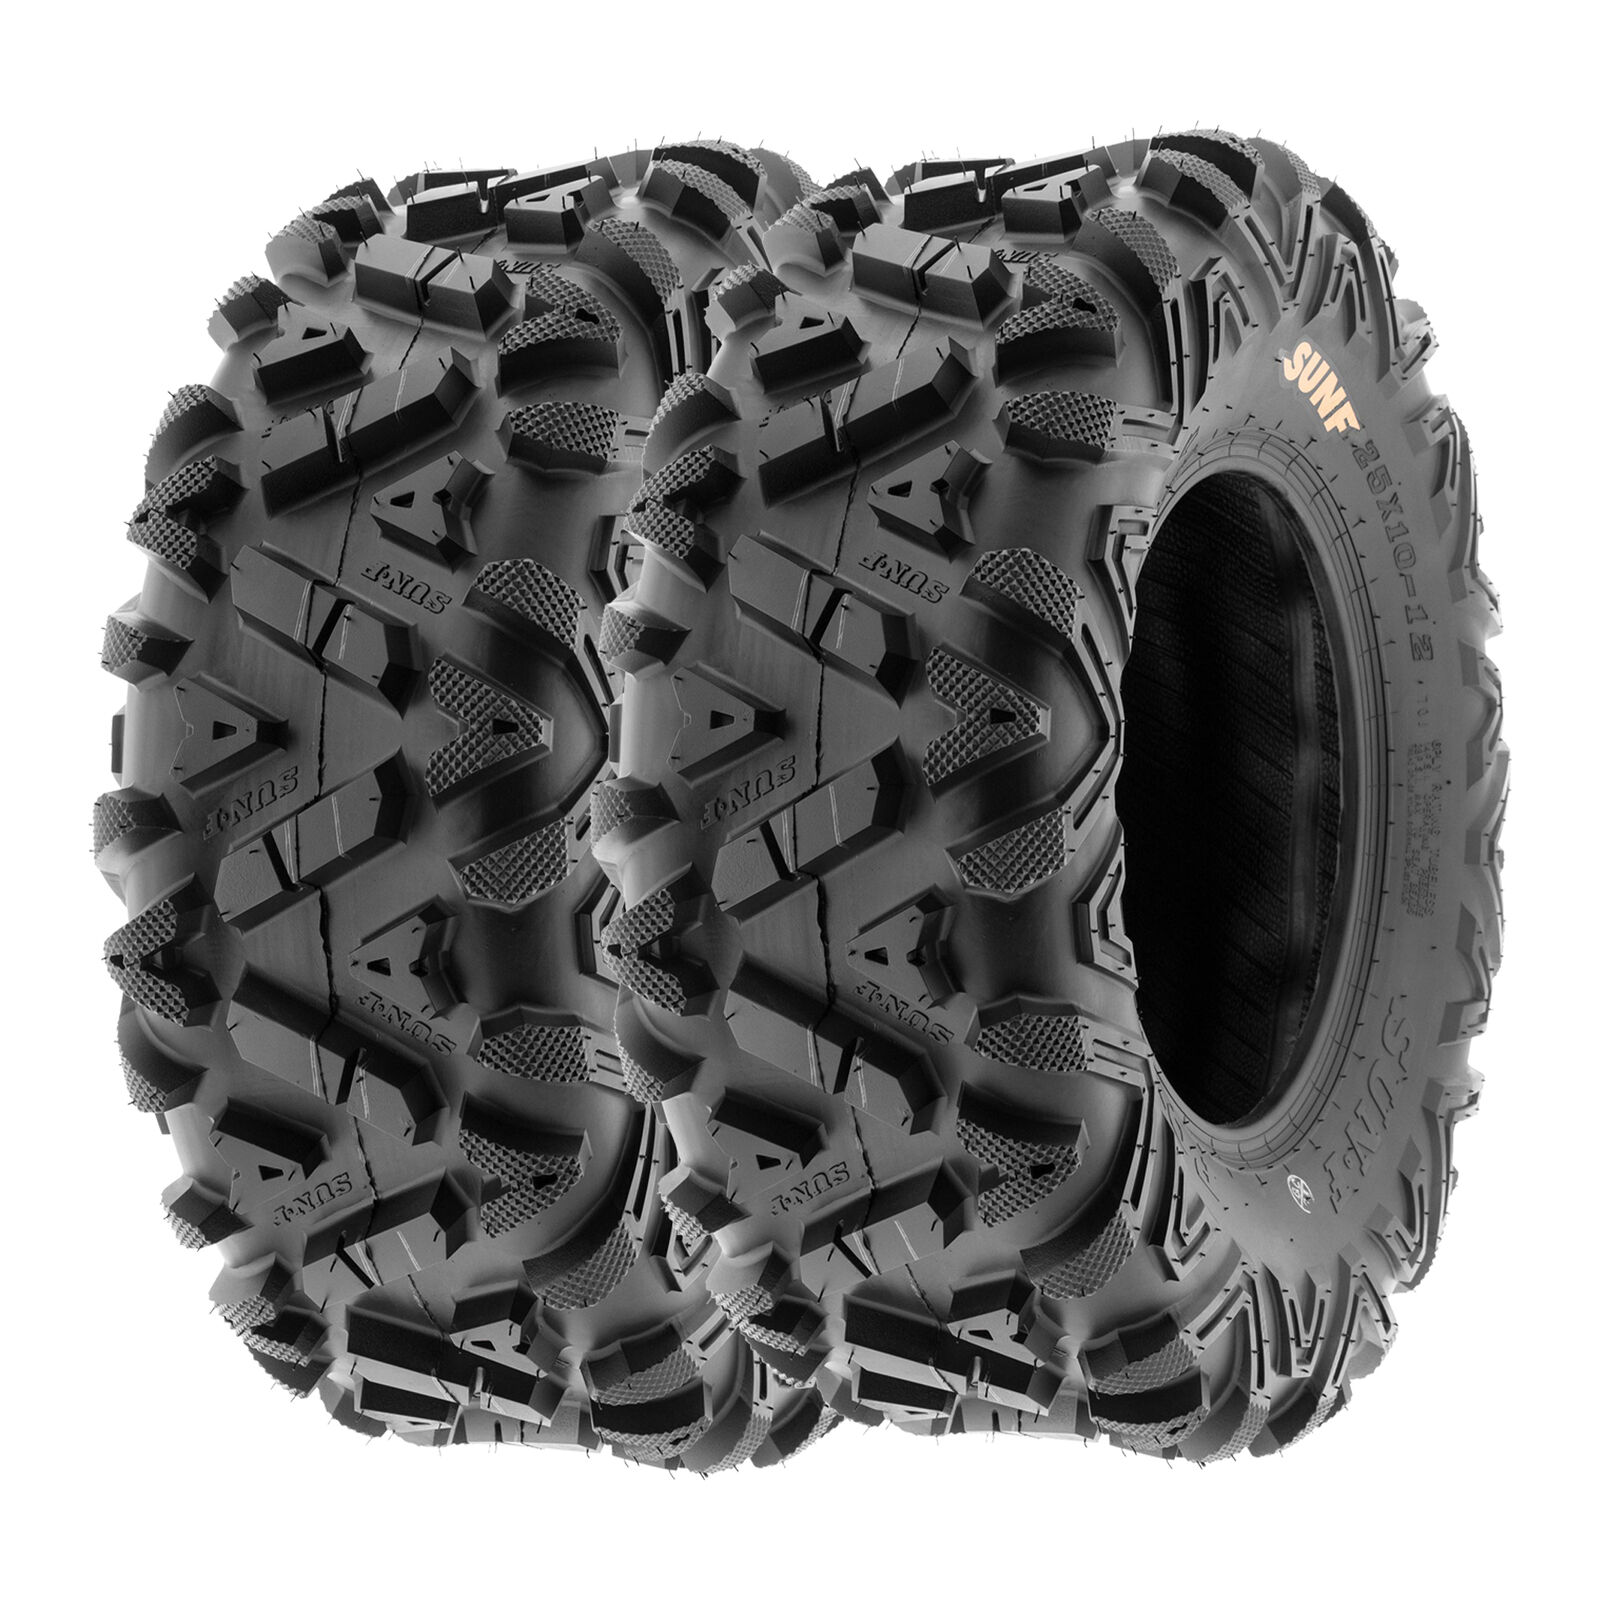 Set of 2 SunF  ATV UTV Tires 26x11-12 26x11x12 Mud Rear 6 PR A048 Tubeless